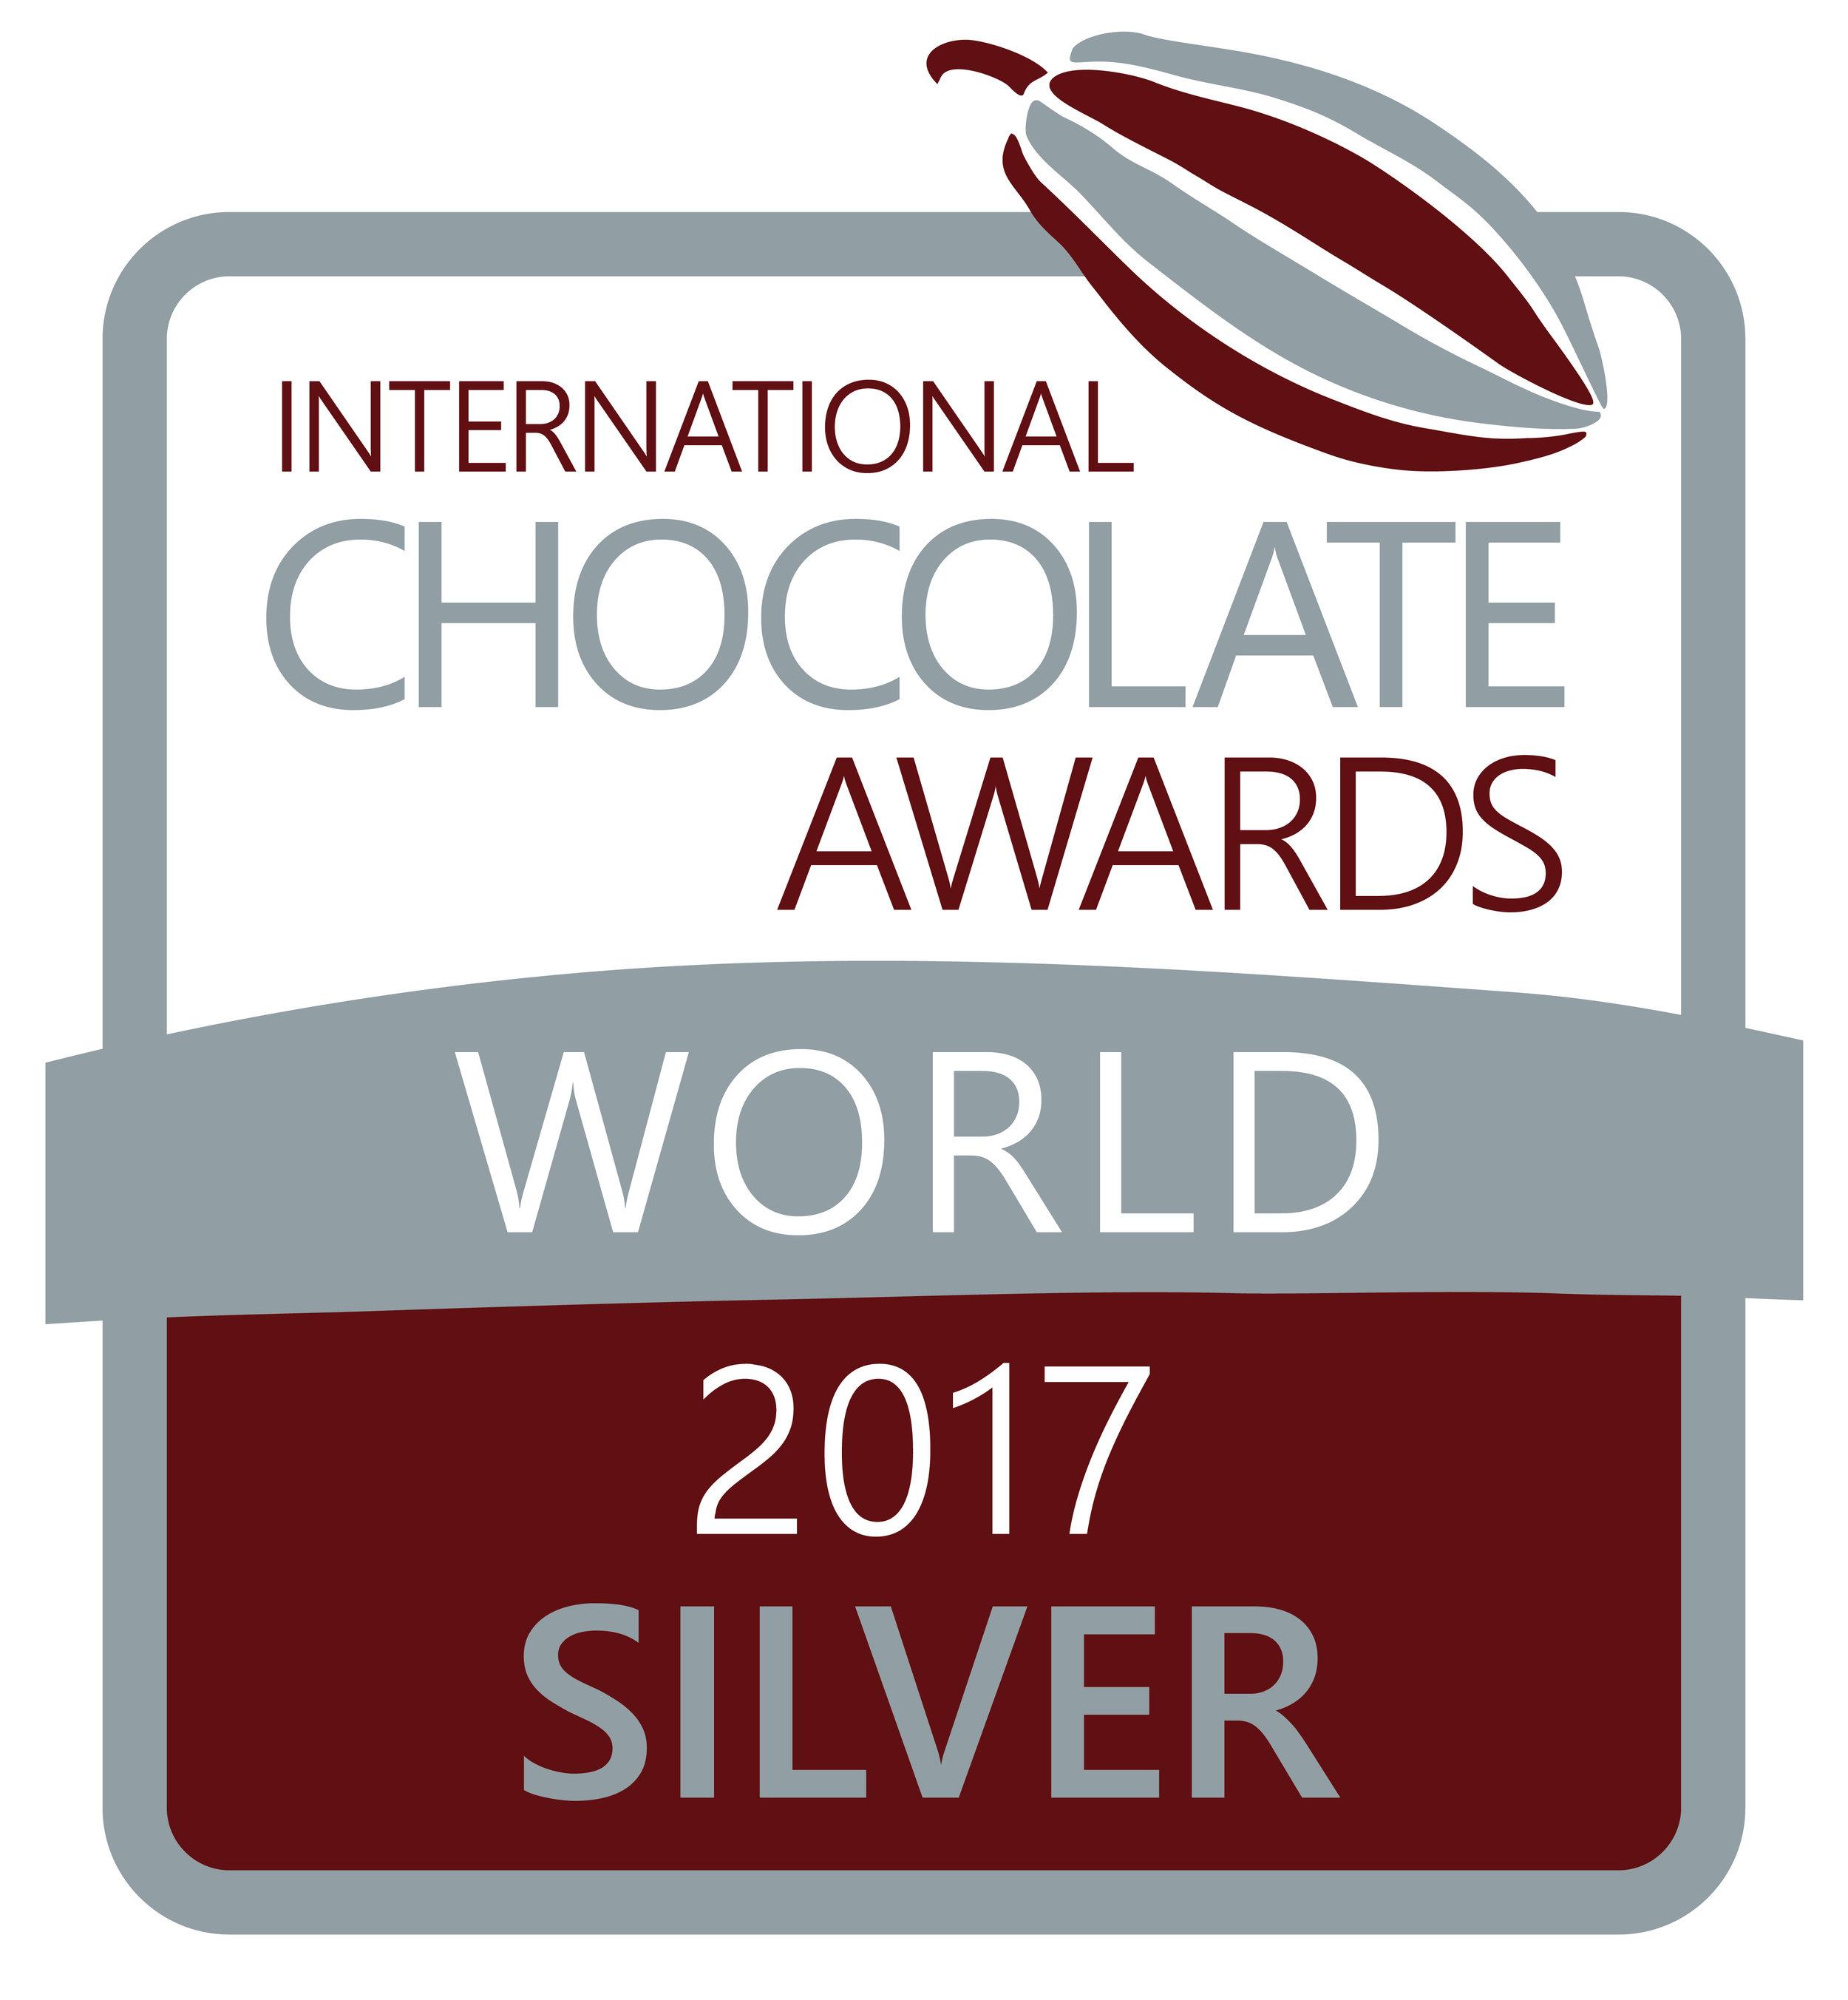 International Chocolate Award Winner 2017